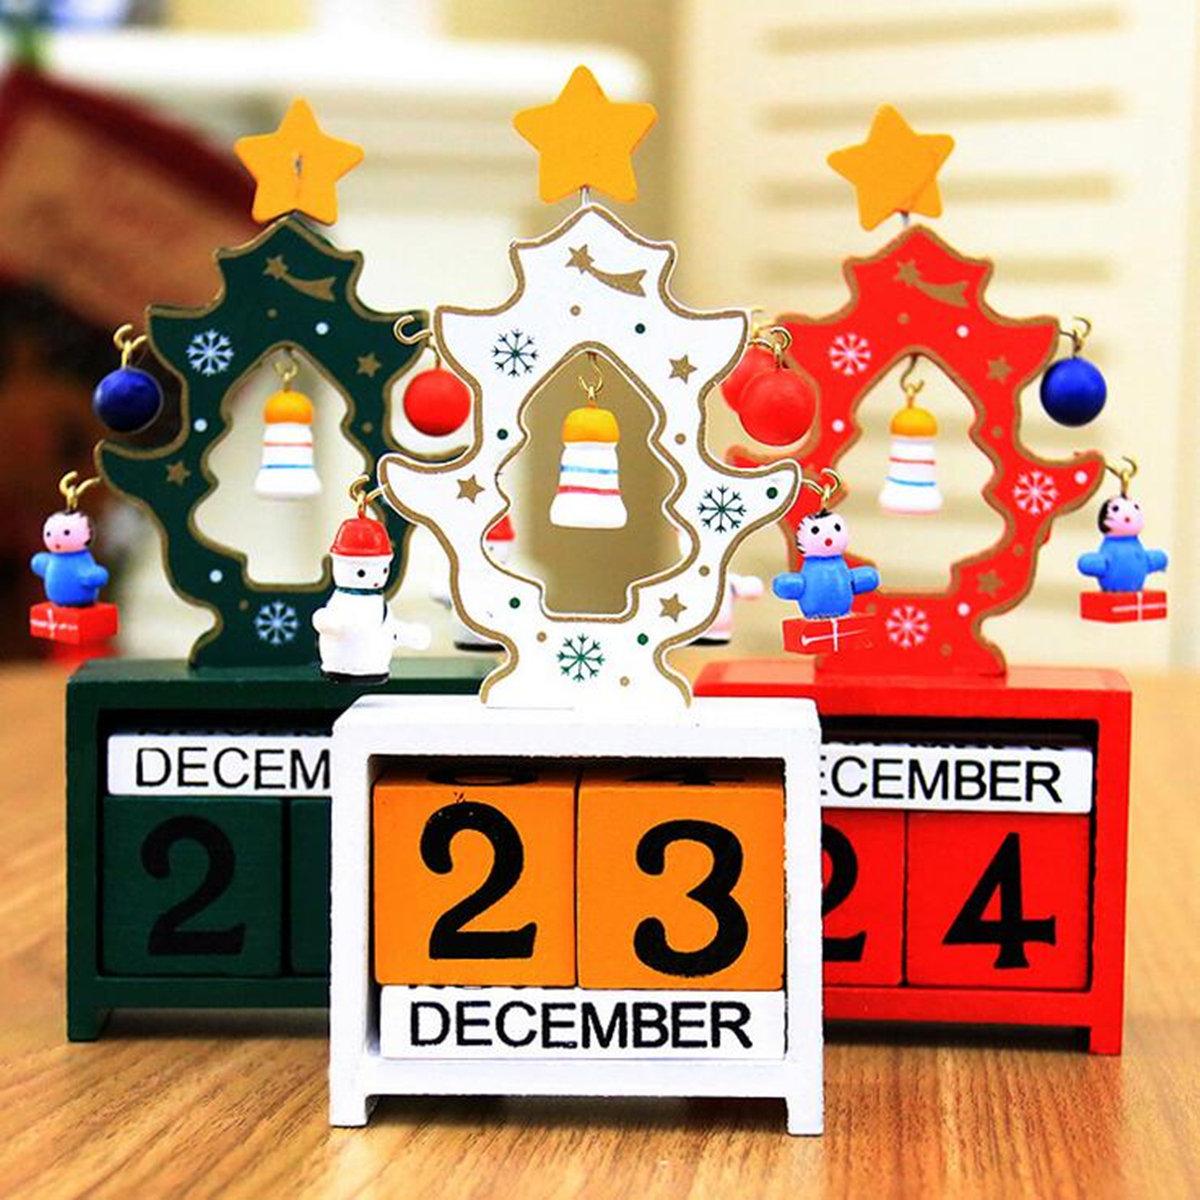 Christmas Creative Gift Mini Wooden Calendar Home Xmas Ornament Table Desk Decor